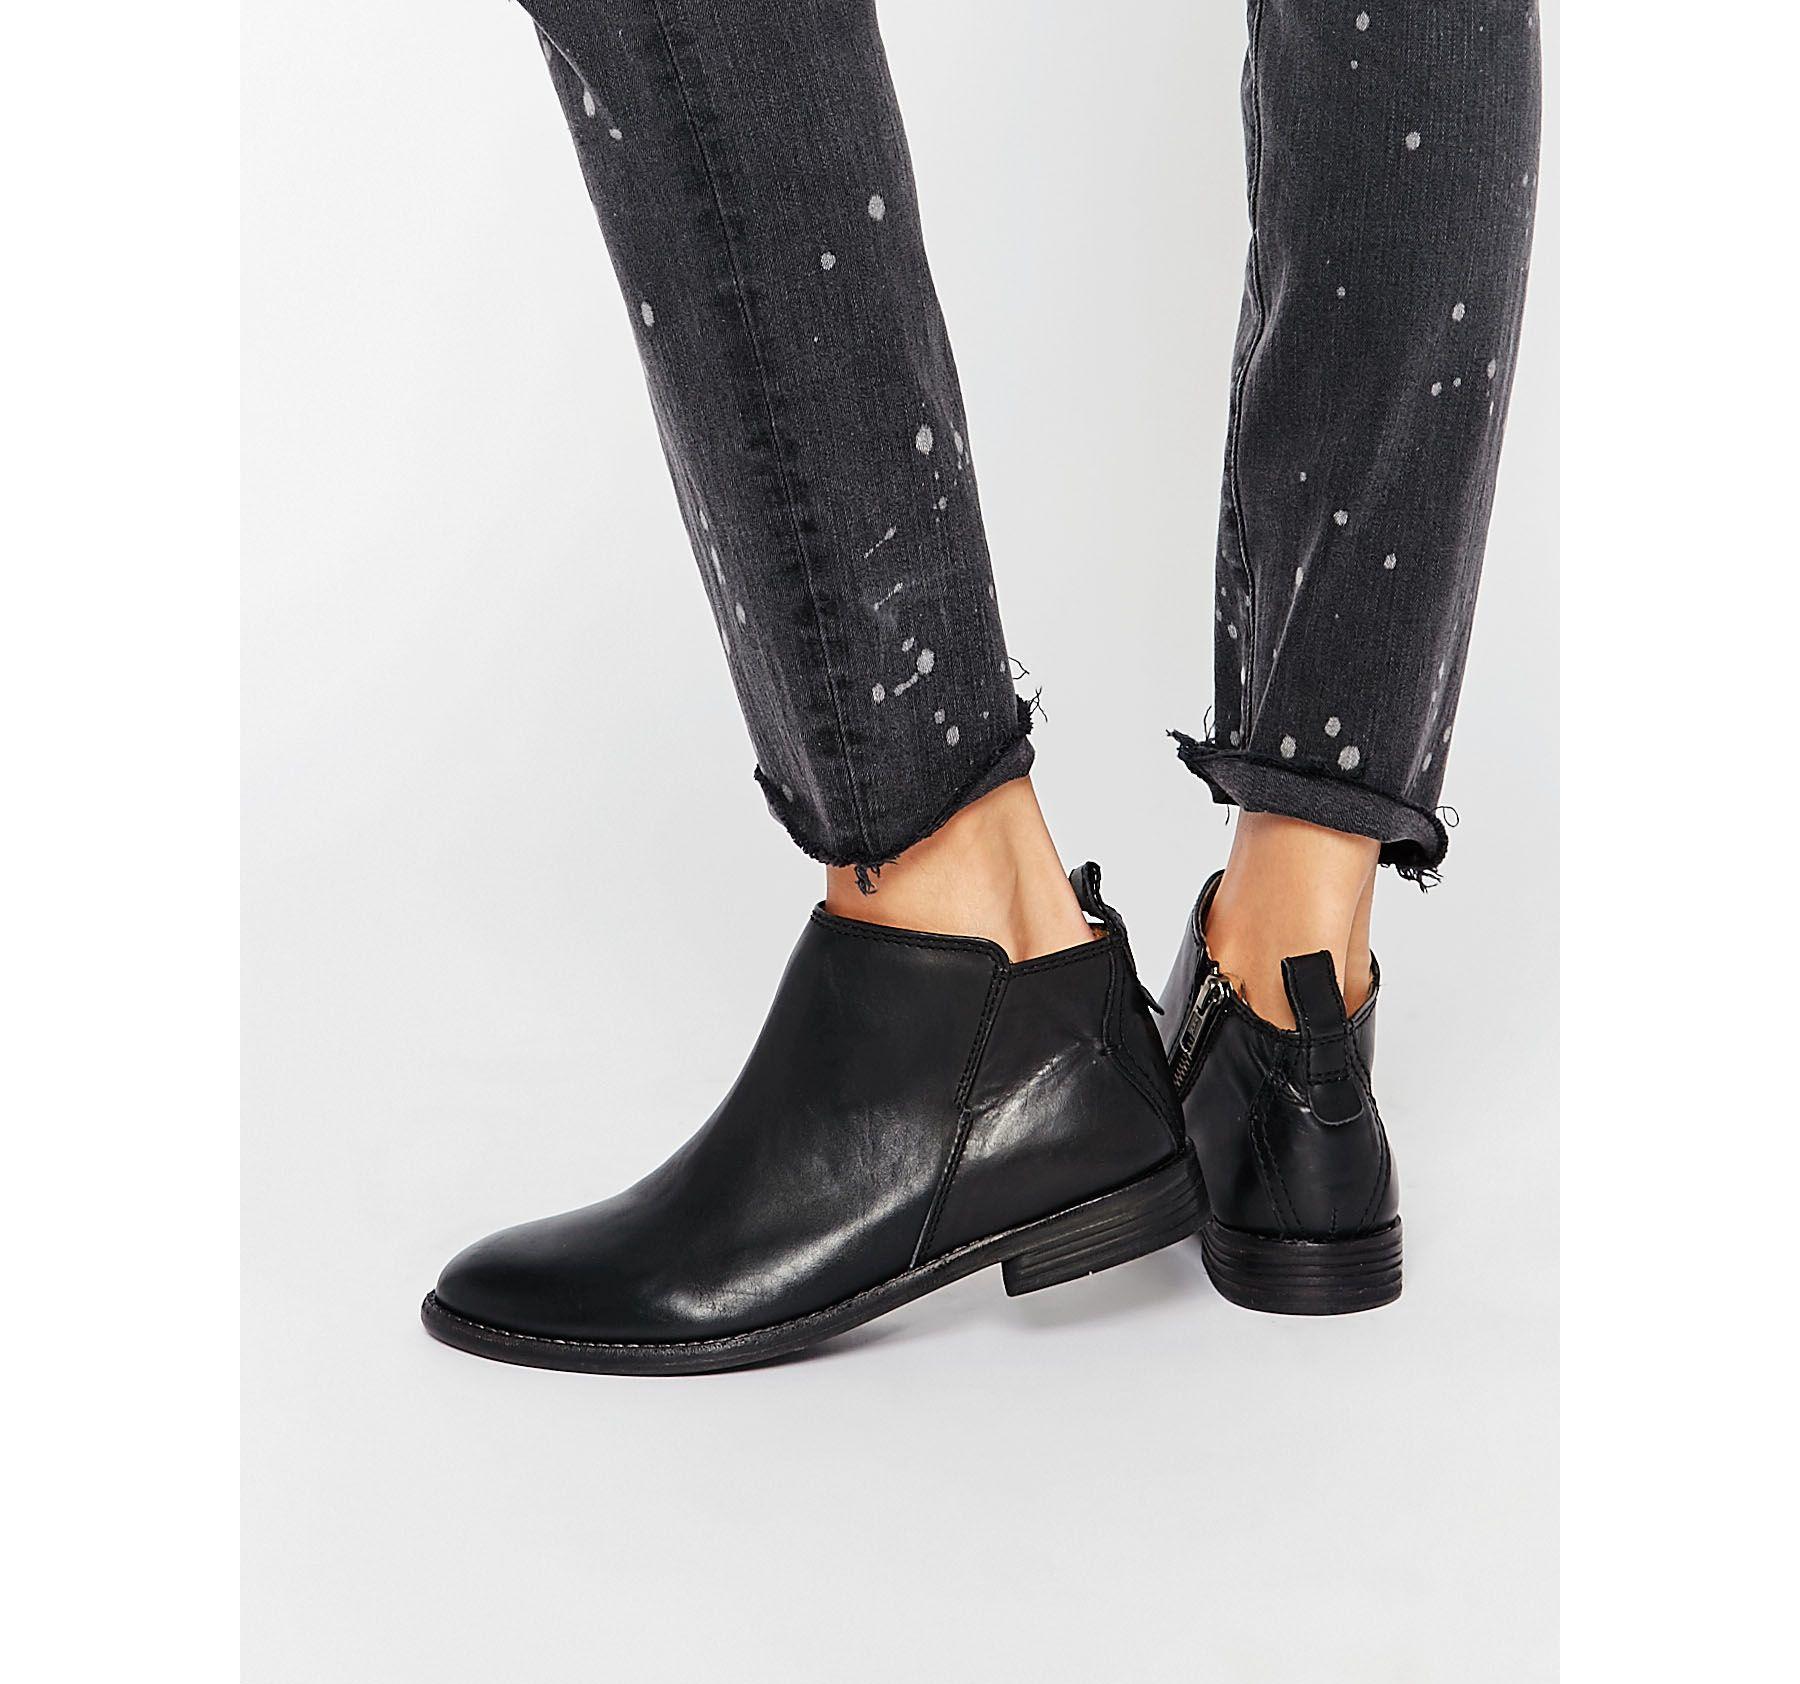 h by hudson black leather revelin ankle boot in black lyst. Black Bedroom Furniture Sets. Home Design Ideas